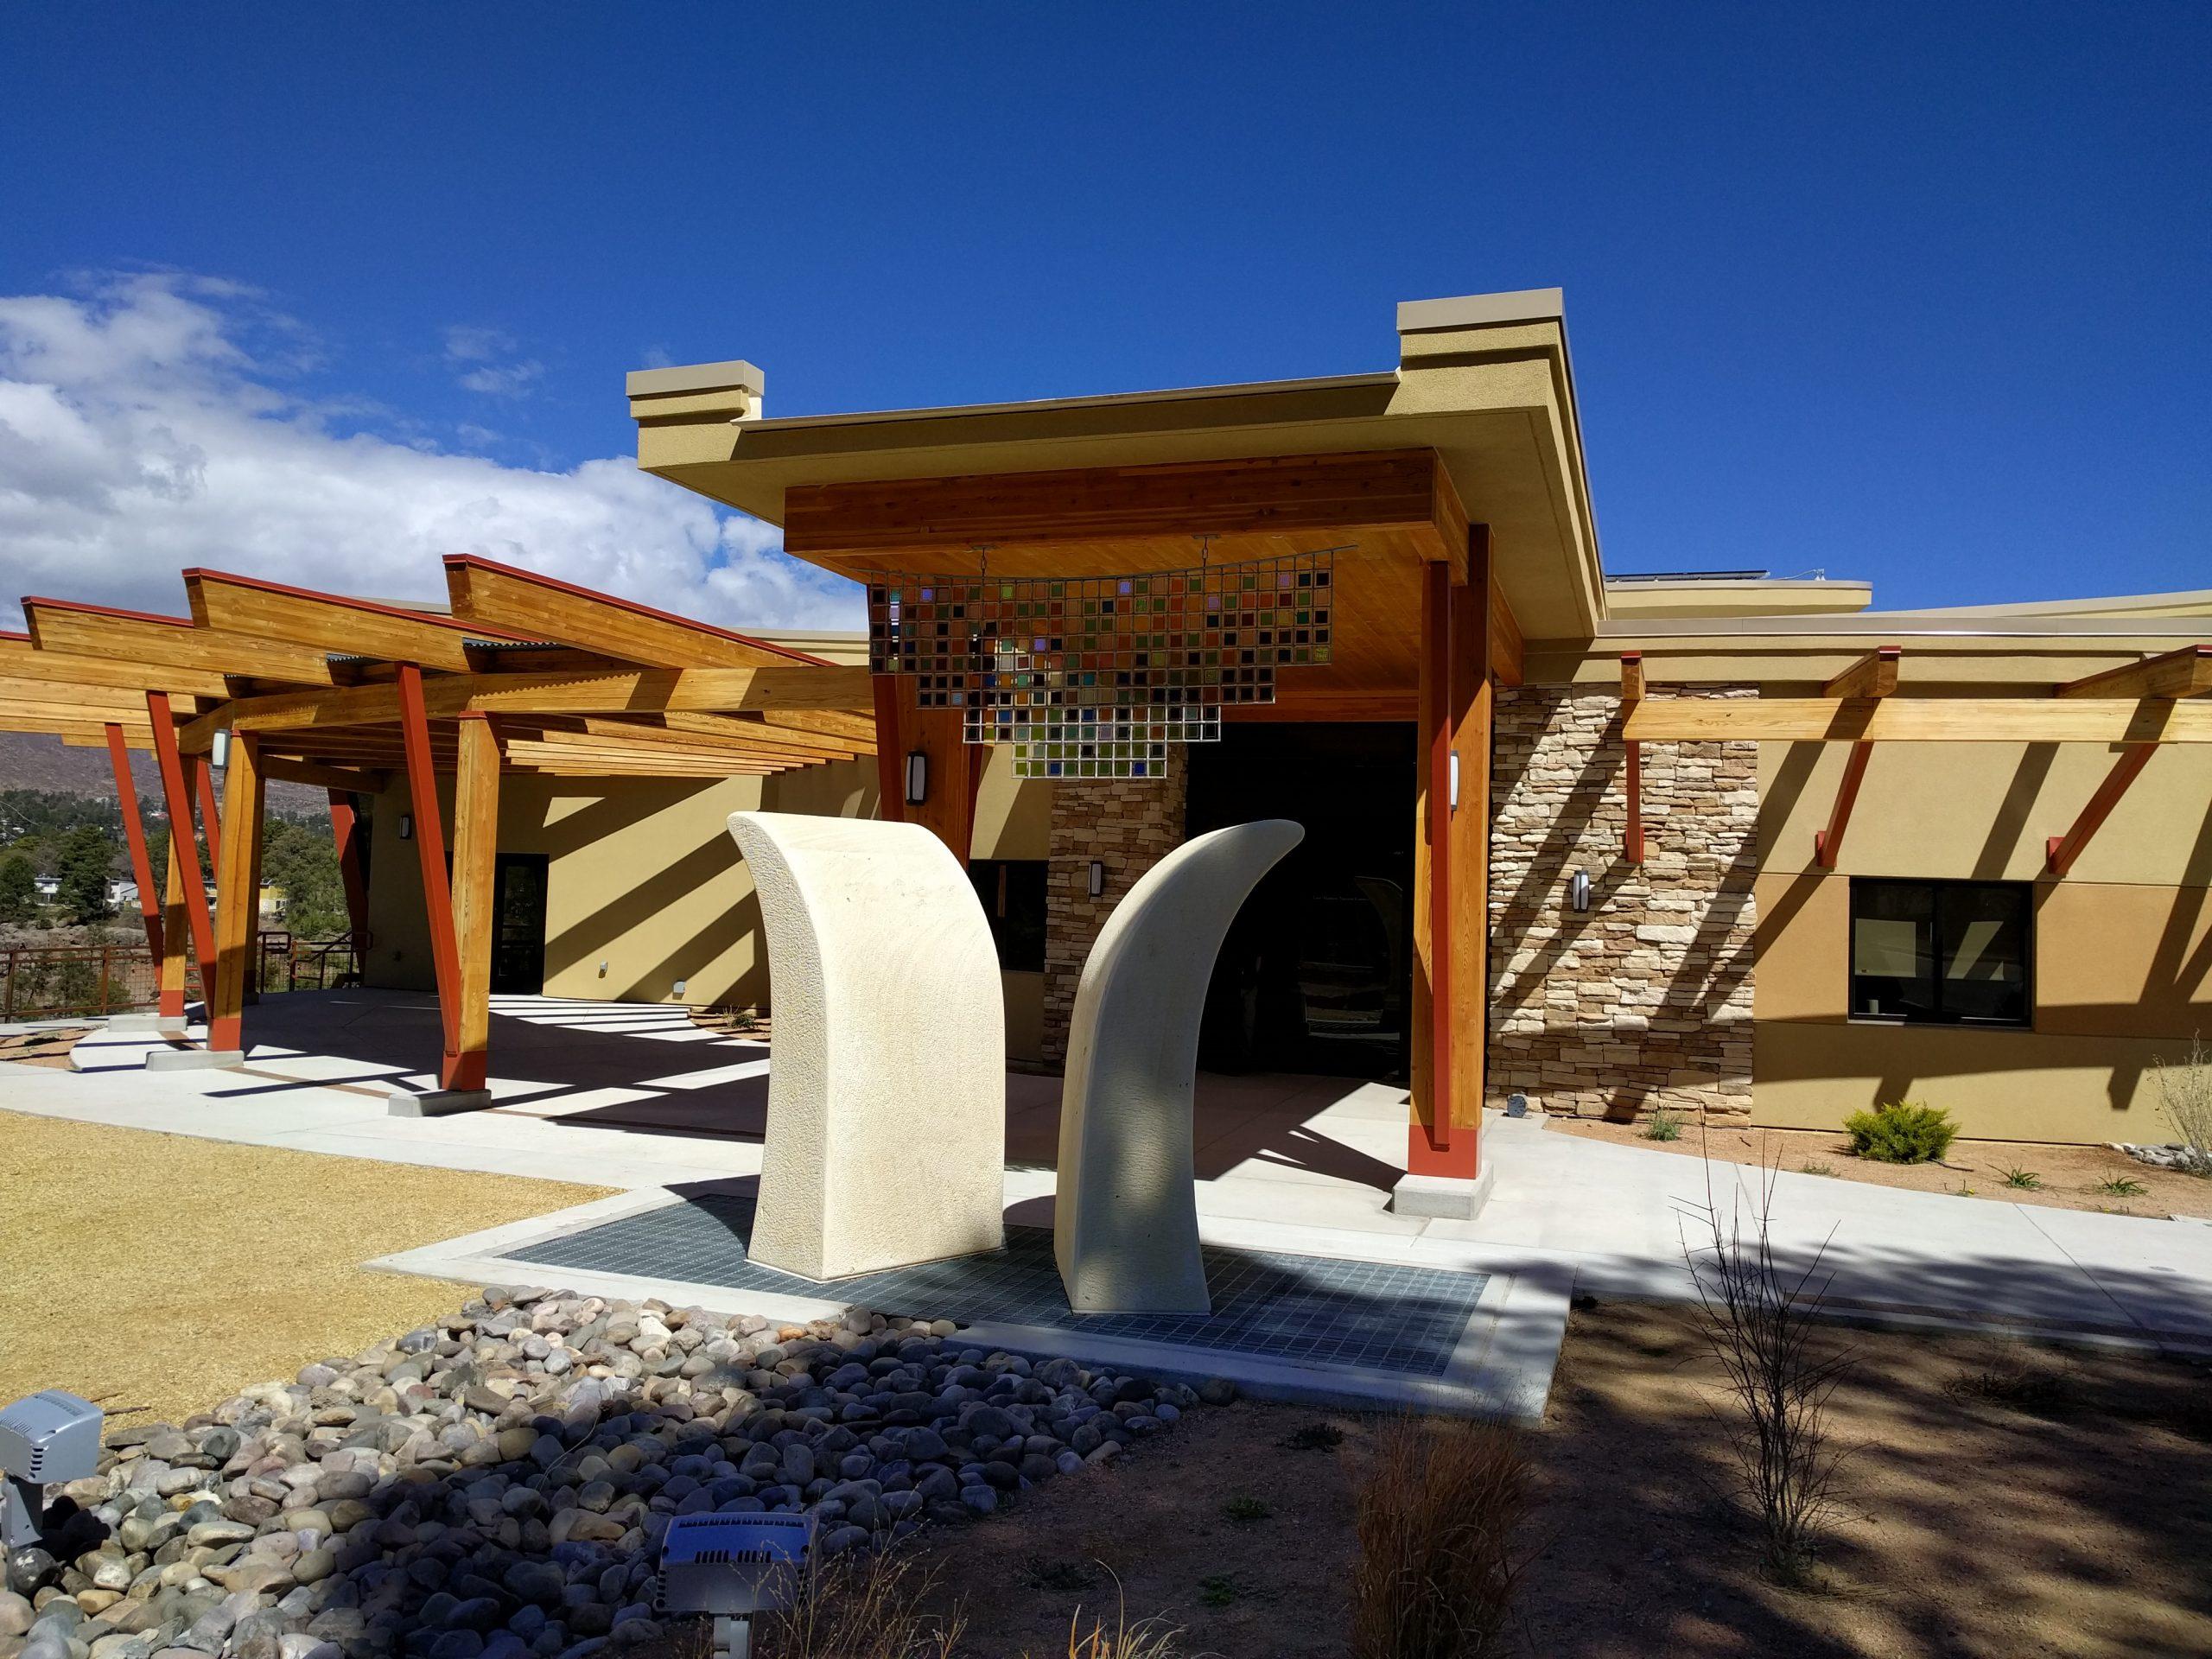 Los Alamos Nature Center